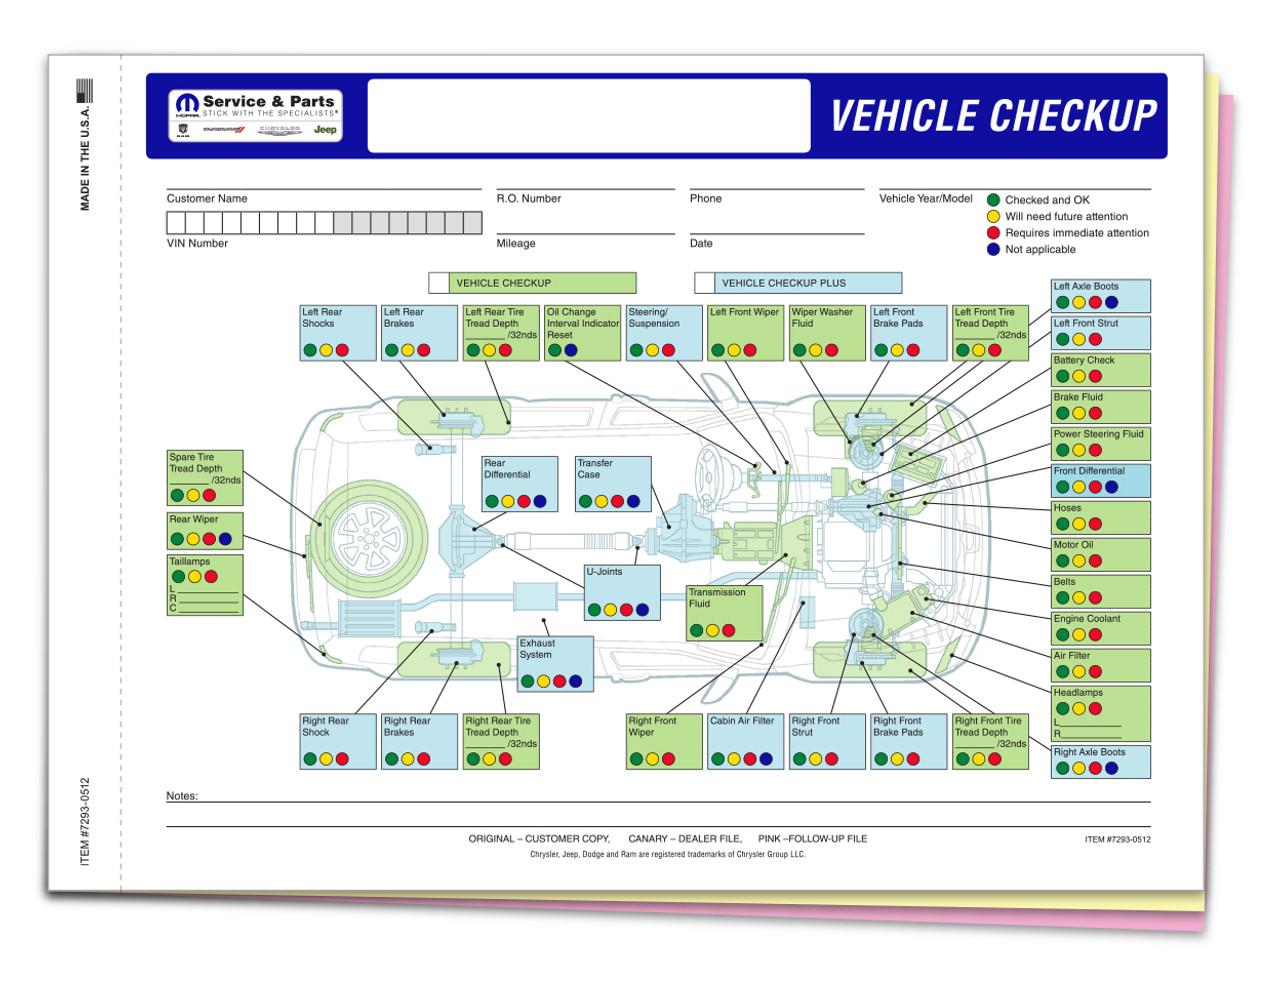 Manufacturer Specific - Chrysler Multi-Point Inspection 3 Part Form-#7293-0512-Plain